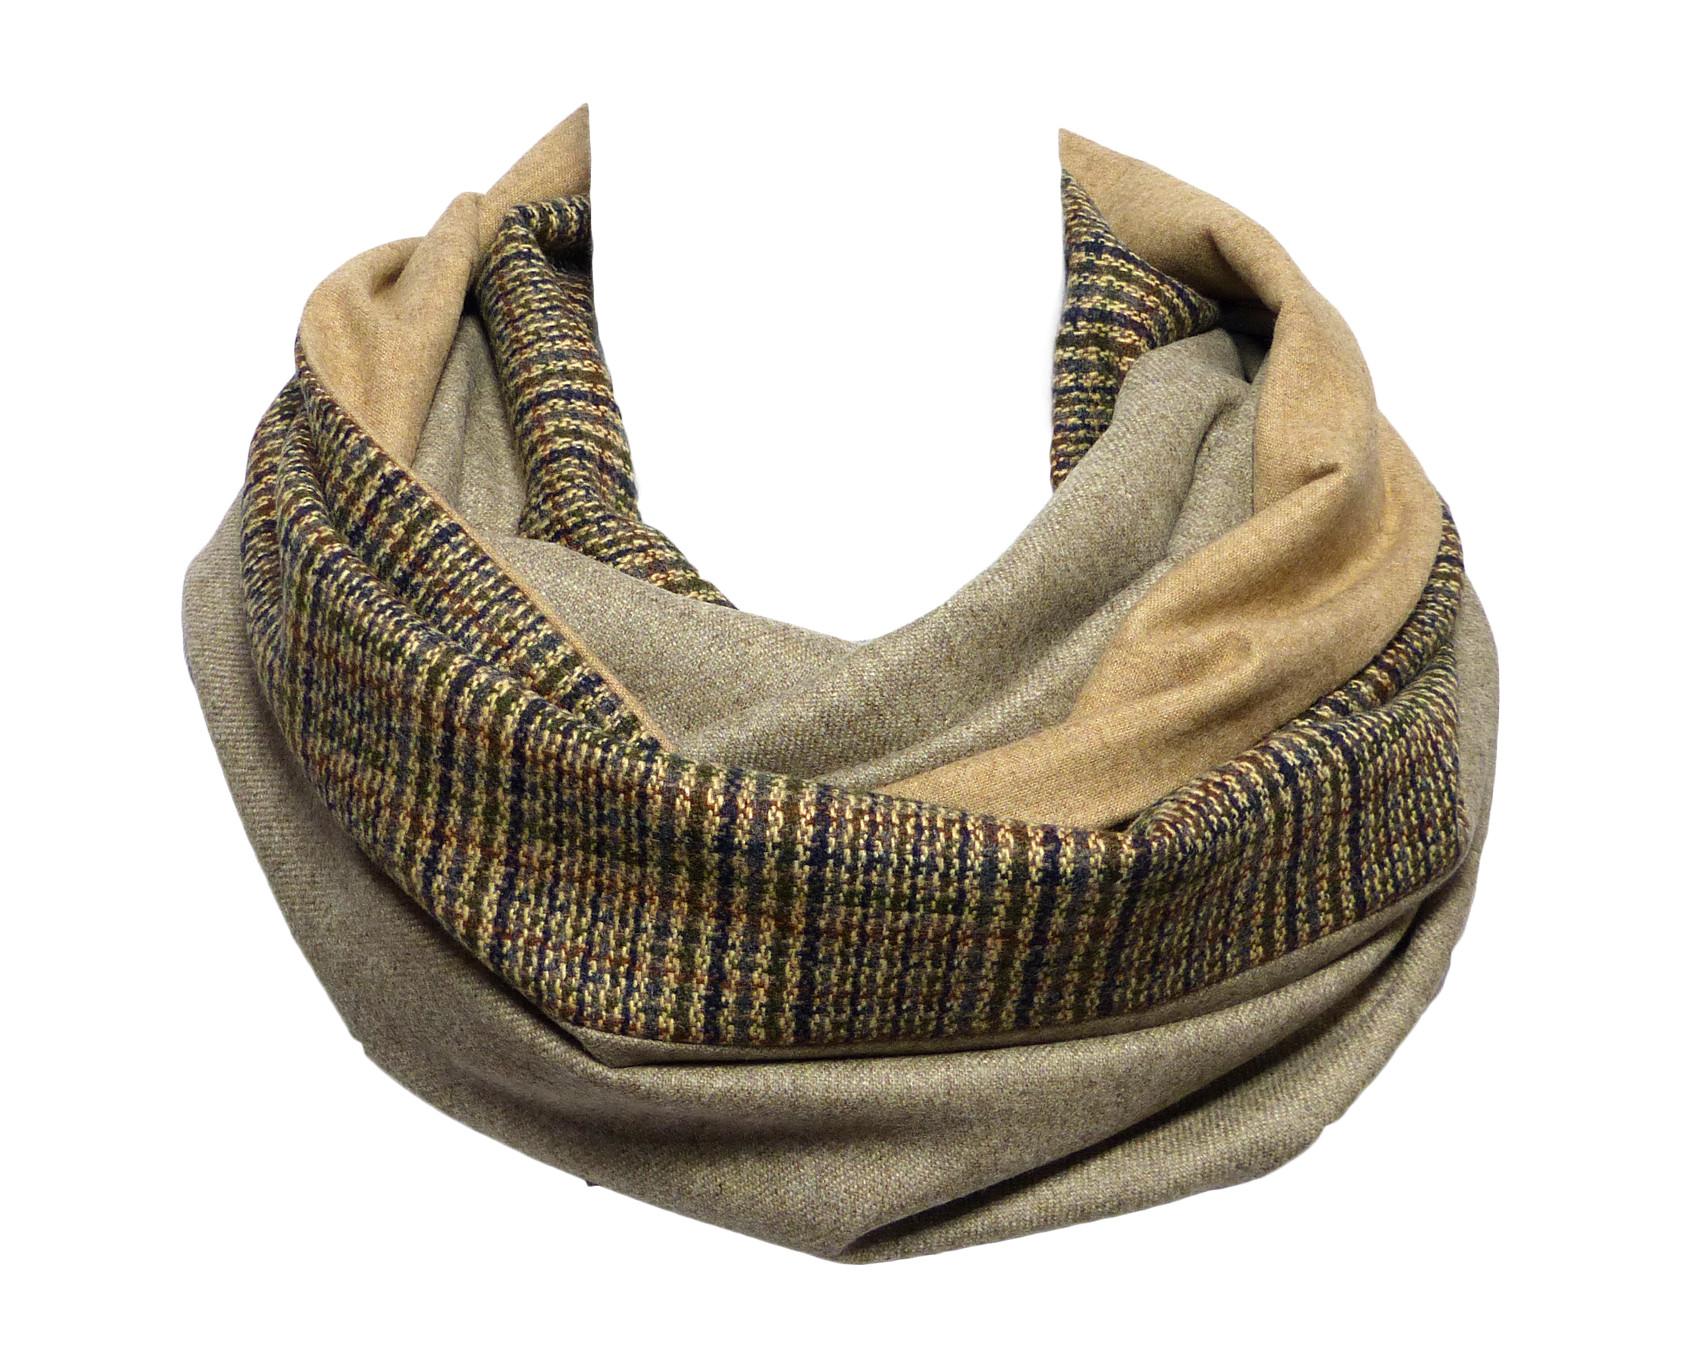 Echarpe Tube   Snood en laine, tweed marron   beige, tissus unis beige et e7fb58065d7